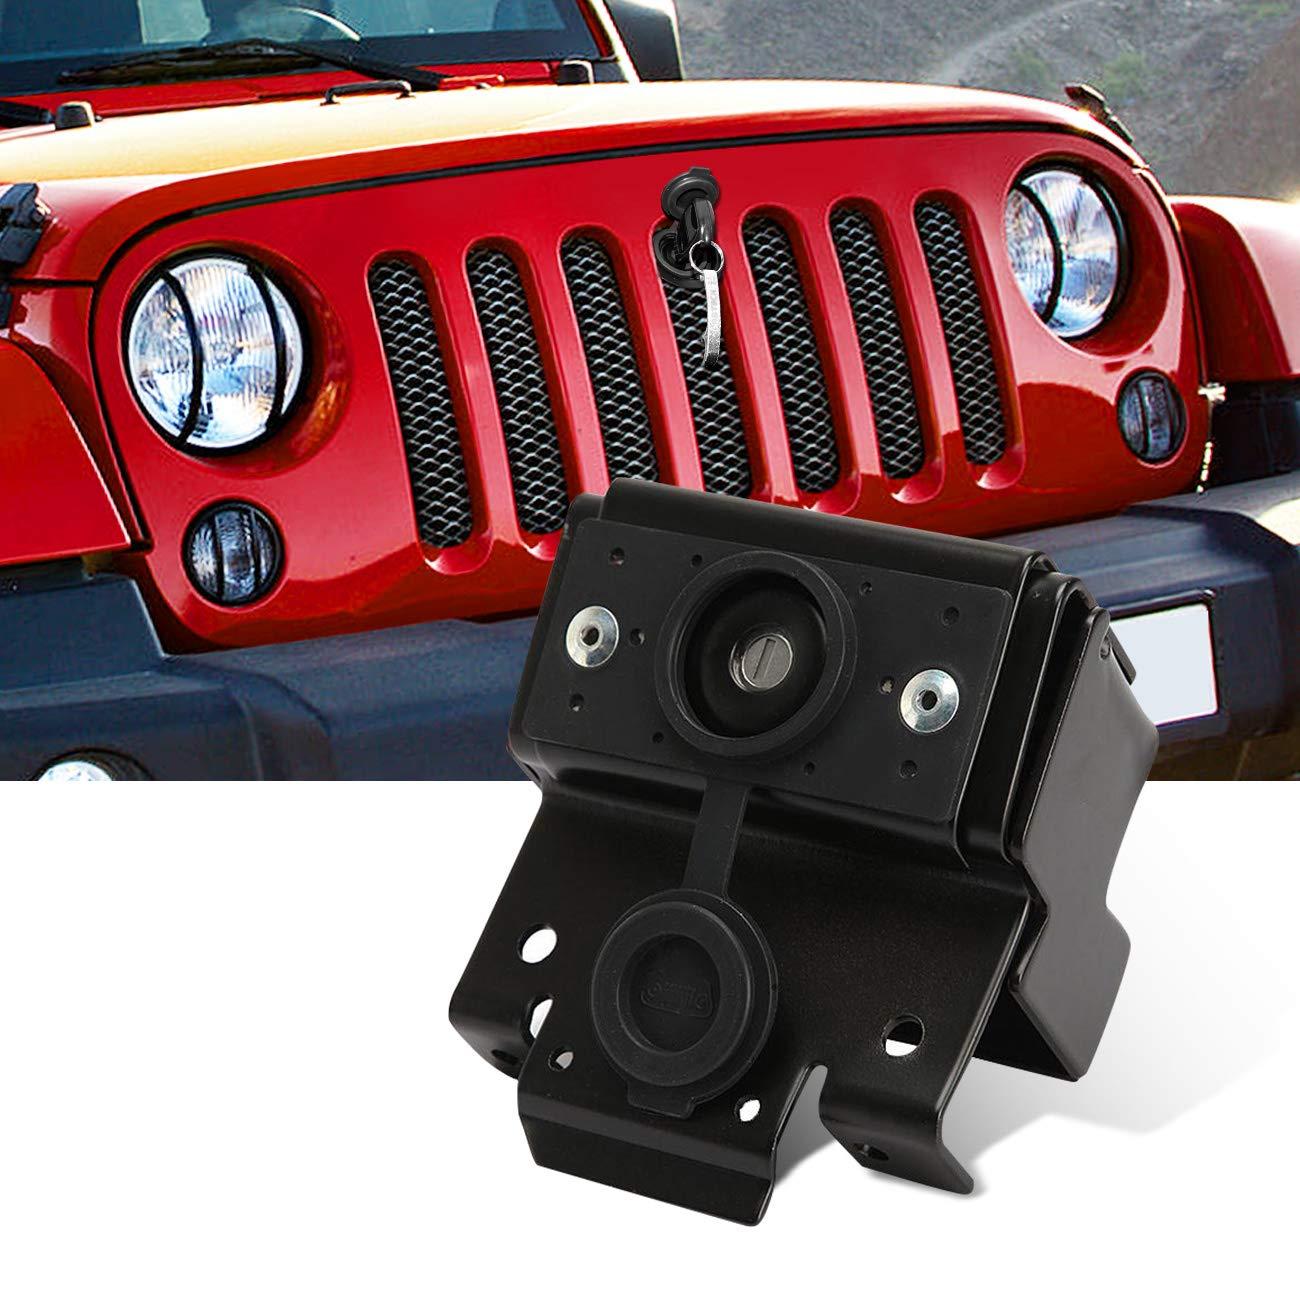 ALAVENTE Hood Lock Anti-Theft Kit for 2007-2017 Jeep Wrangler JK JKU /& Unlimited 2WD 4WD 82213051-AB